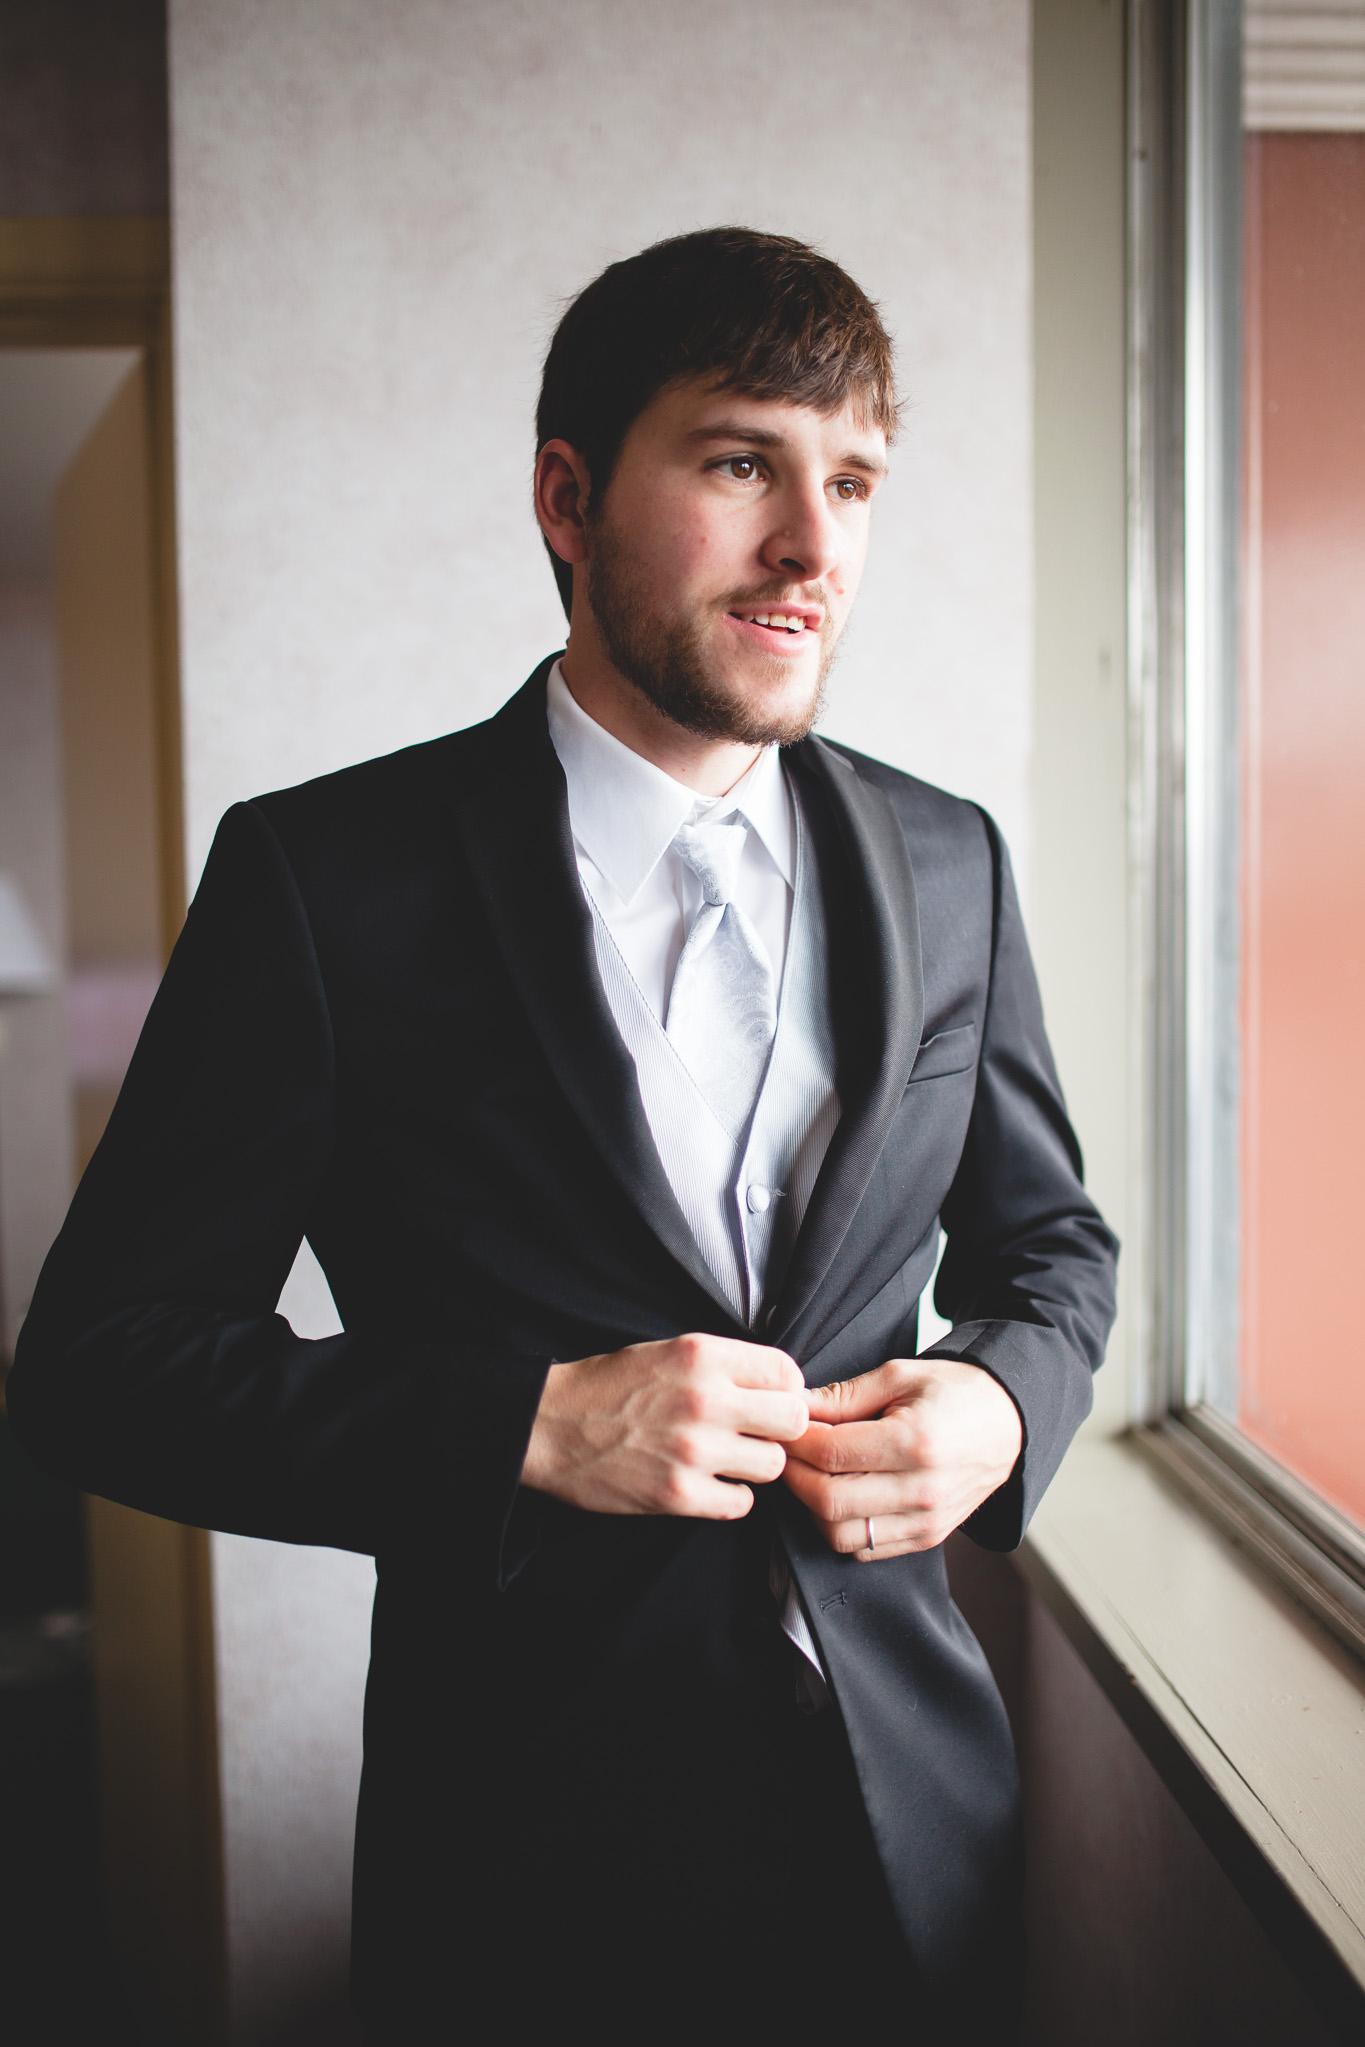 028-Jonathan-Kuhn-Photography-Victoria-Brandon-Wedding-WEB-1099.jpg